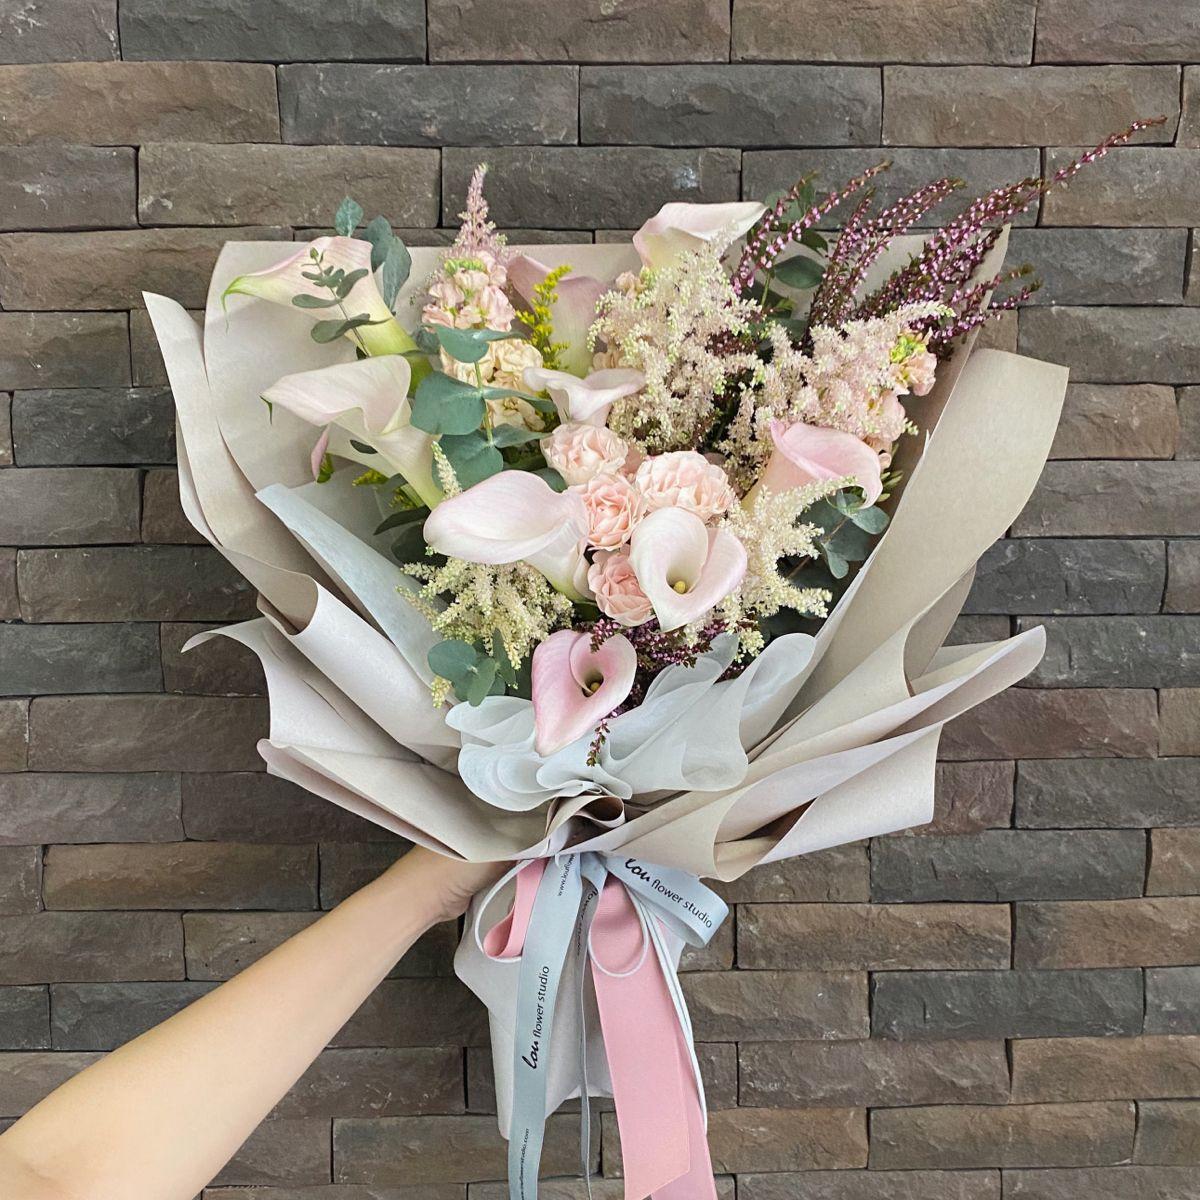 Calla Lilies Bouquet In 2020 Calla Lily Bouquet Pink Hydrangea Bouquet Calla Lily